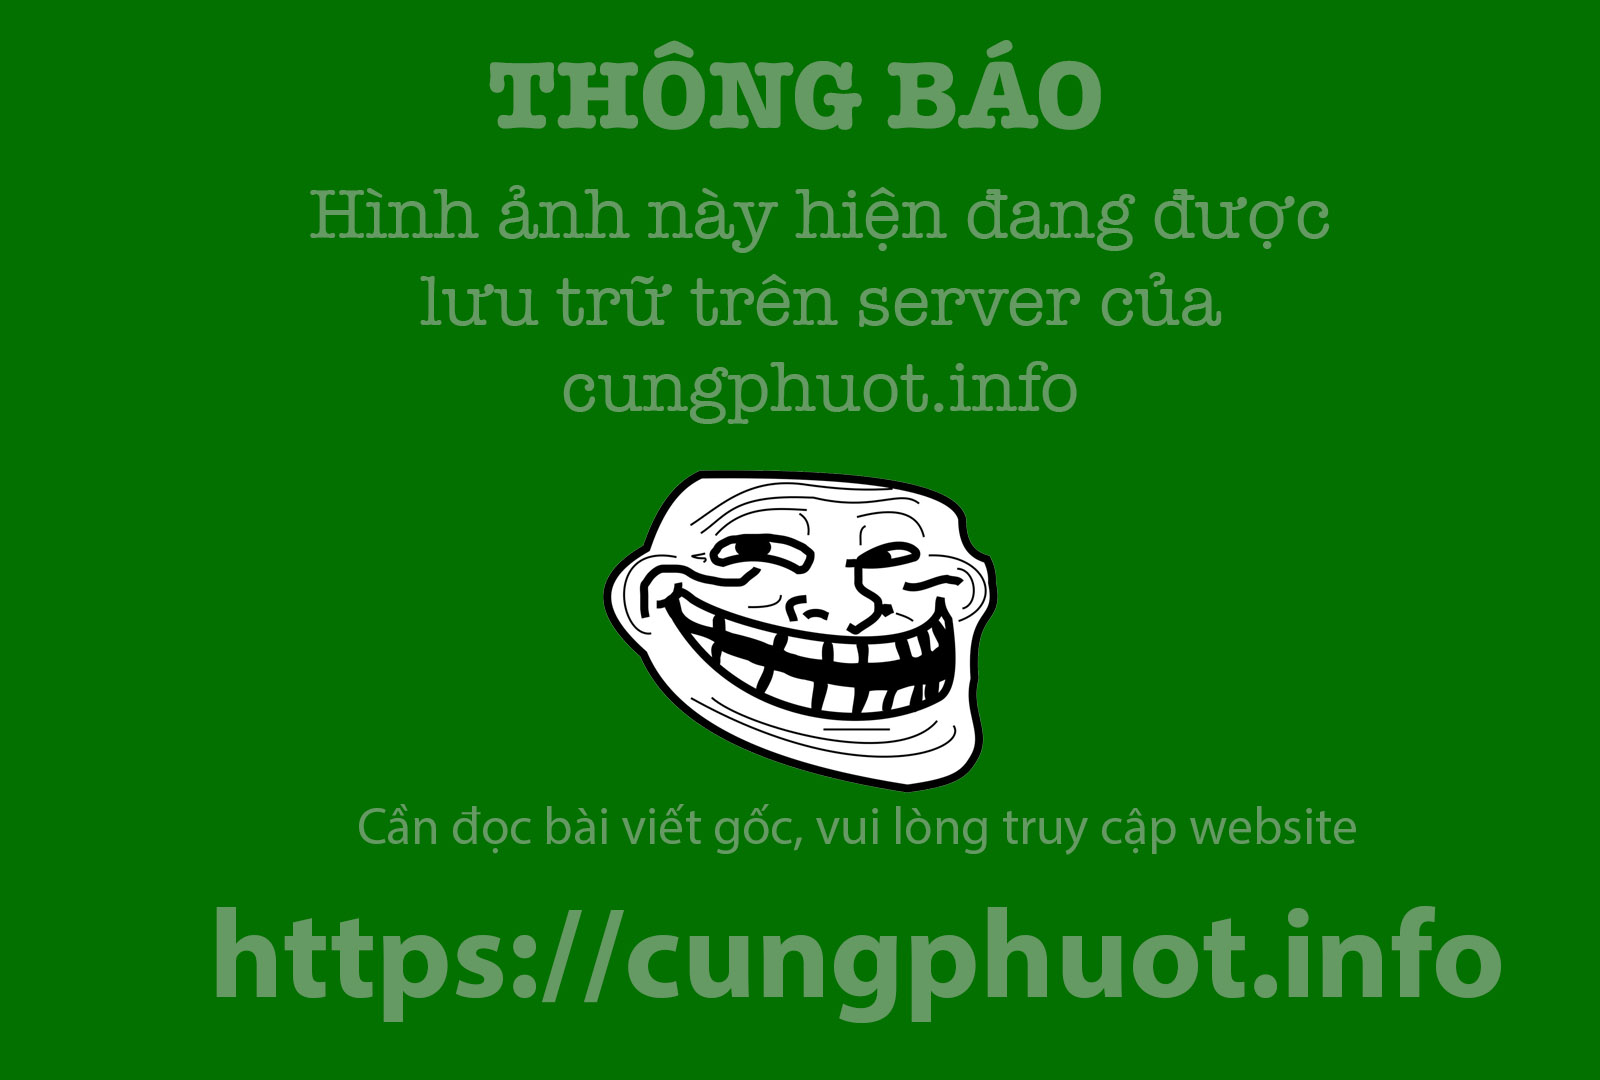 Dan phuot me man ve dep ky vi cua hang Prai o Quang Tri hinh anh 3